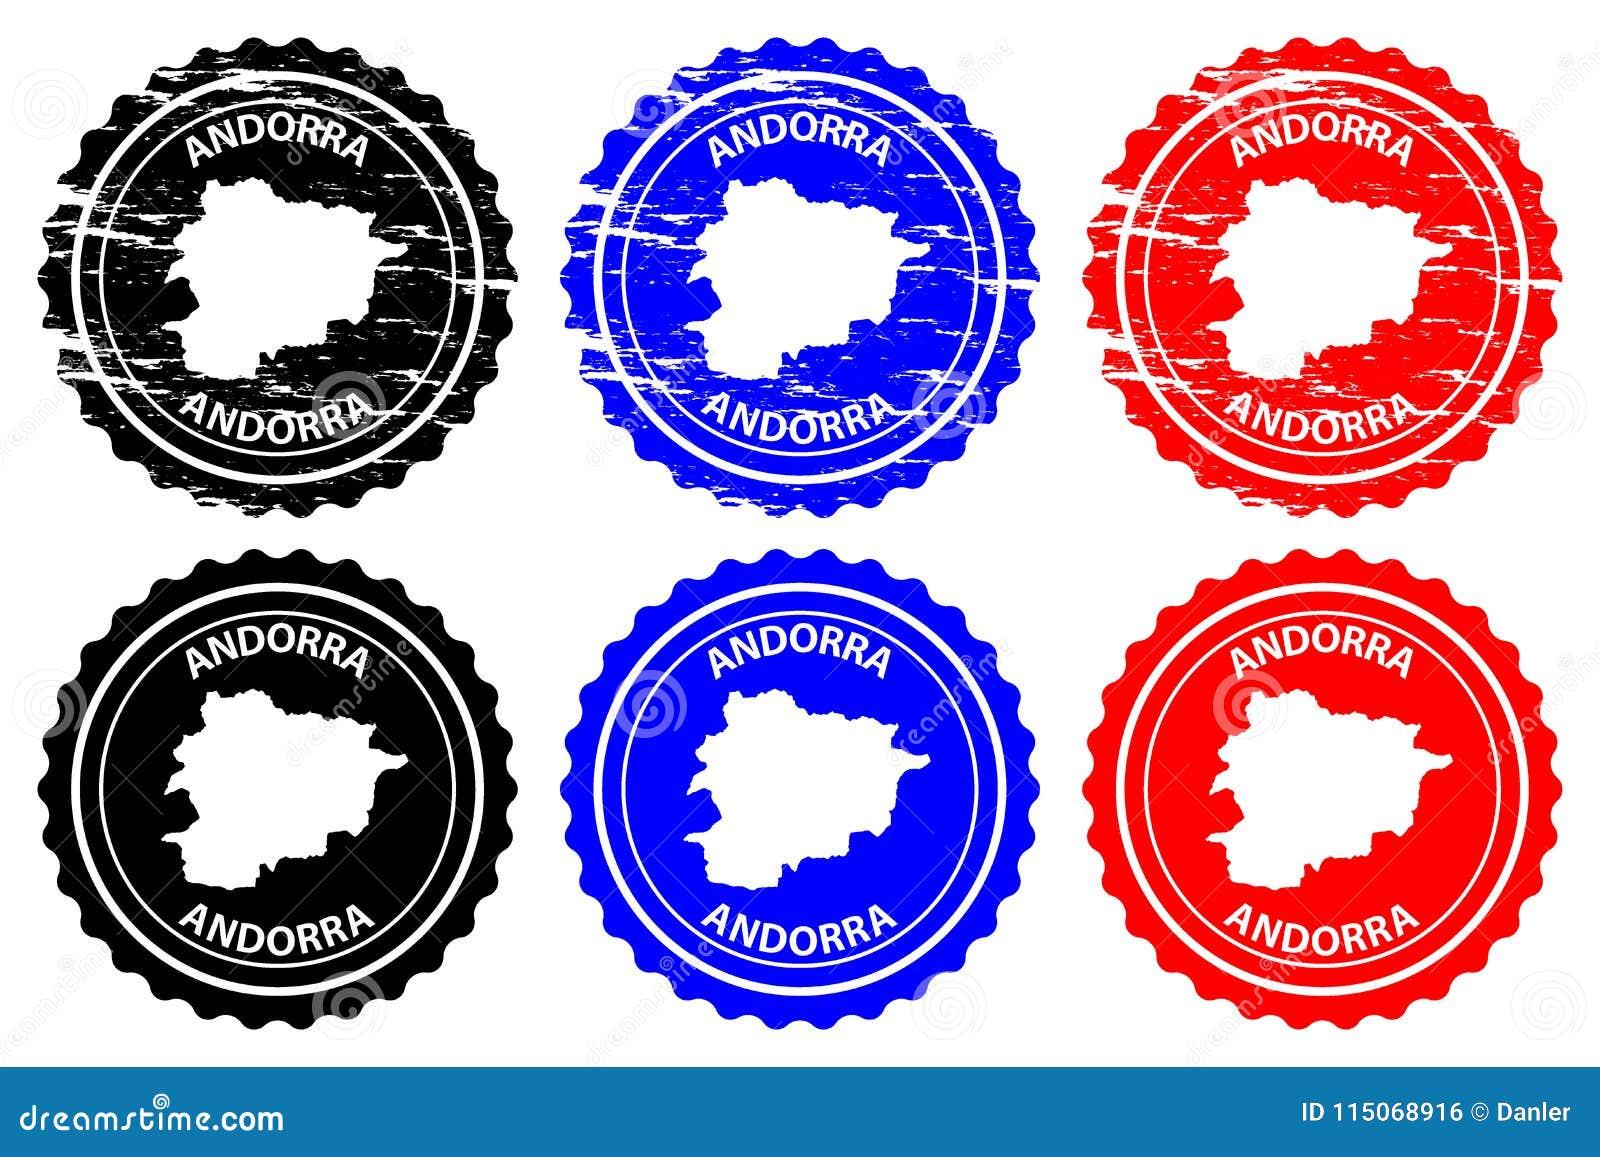 Andorra Rubber Stamp Stock Vector Illustration Of Passport